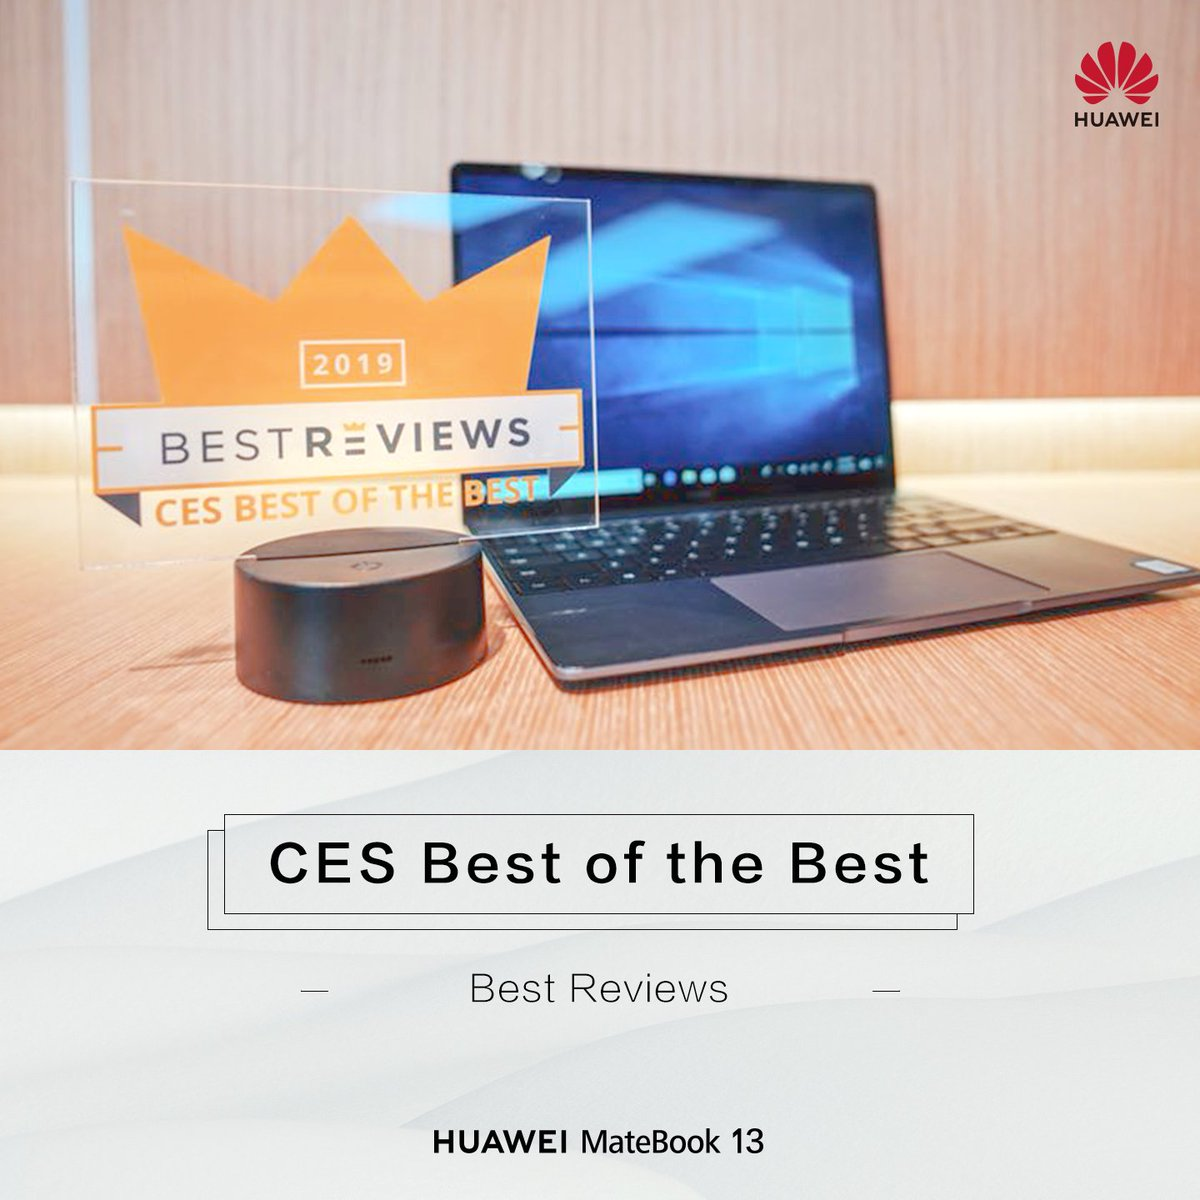 Huawei Mobile Huaweimobile Twitter